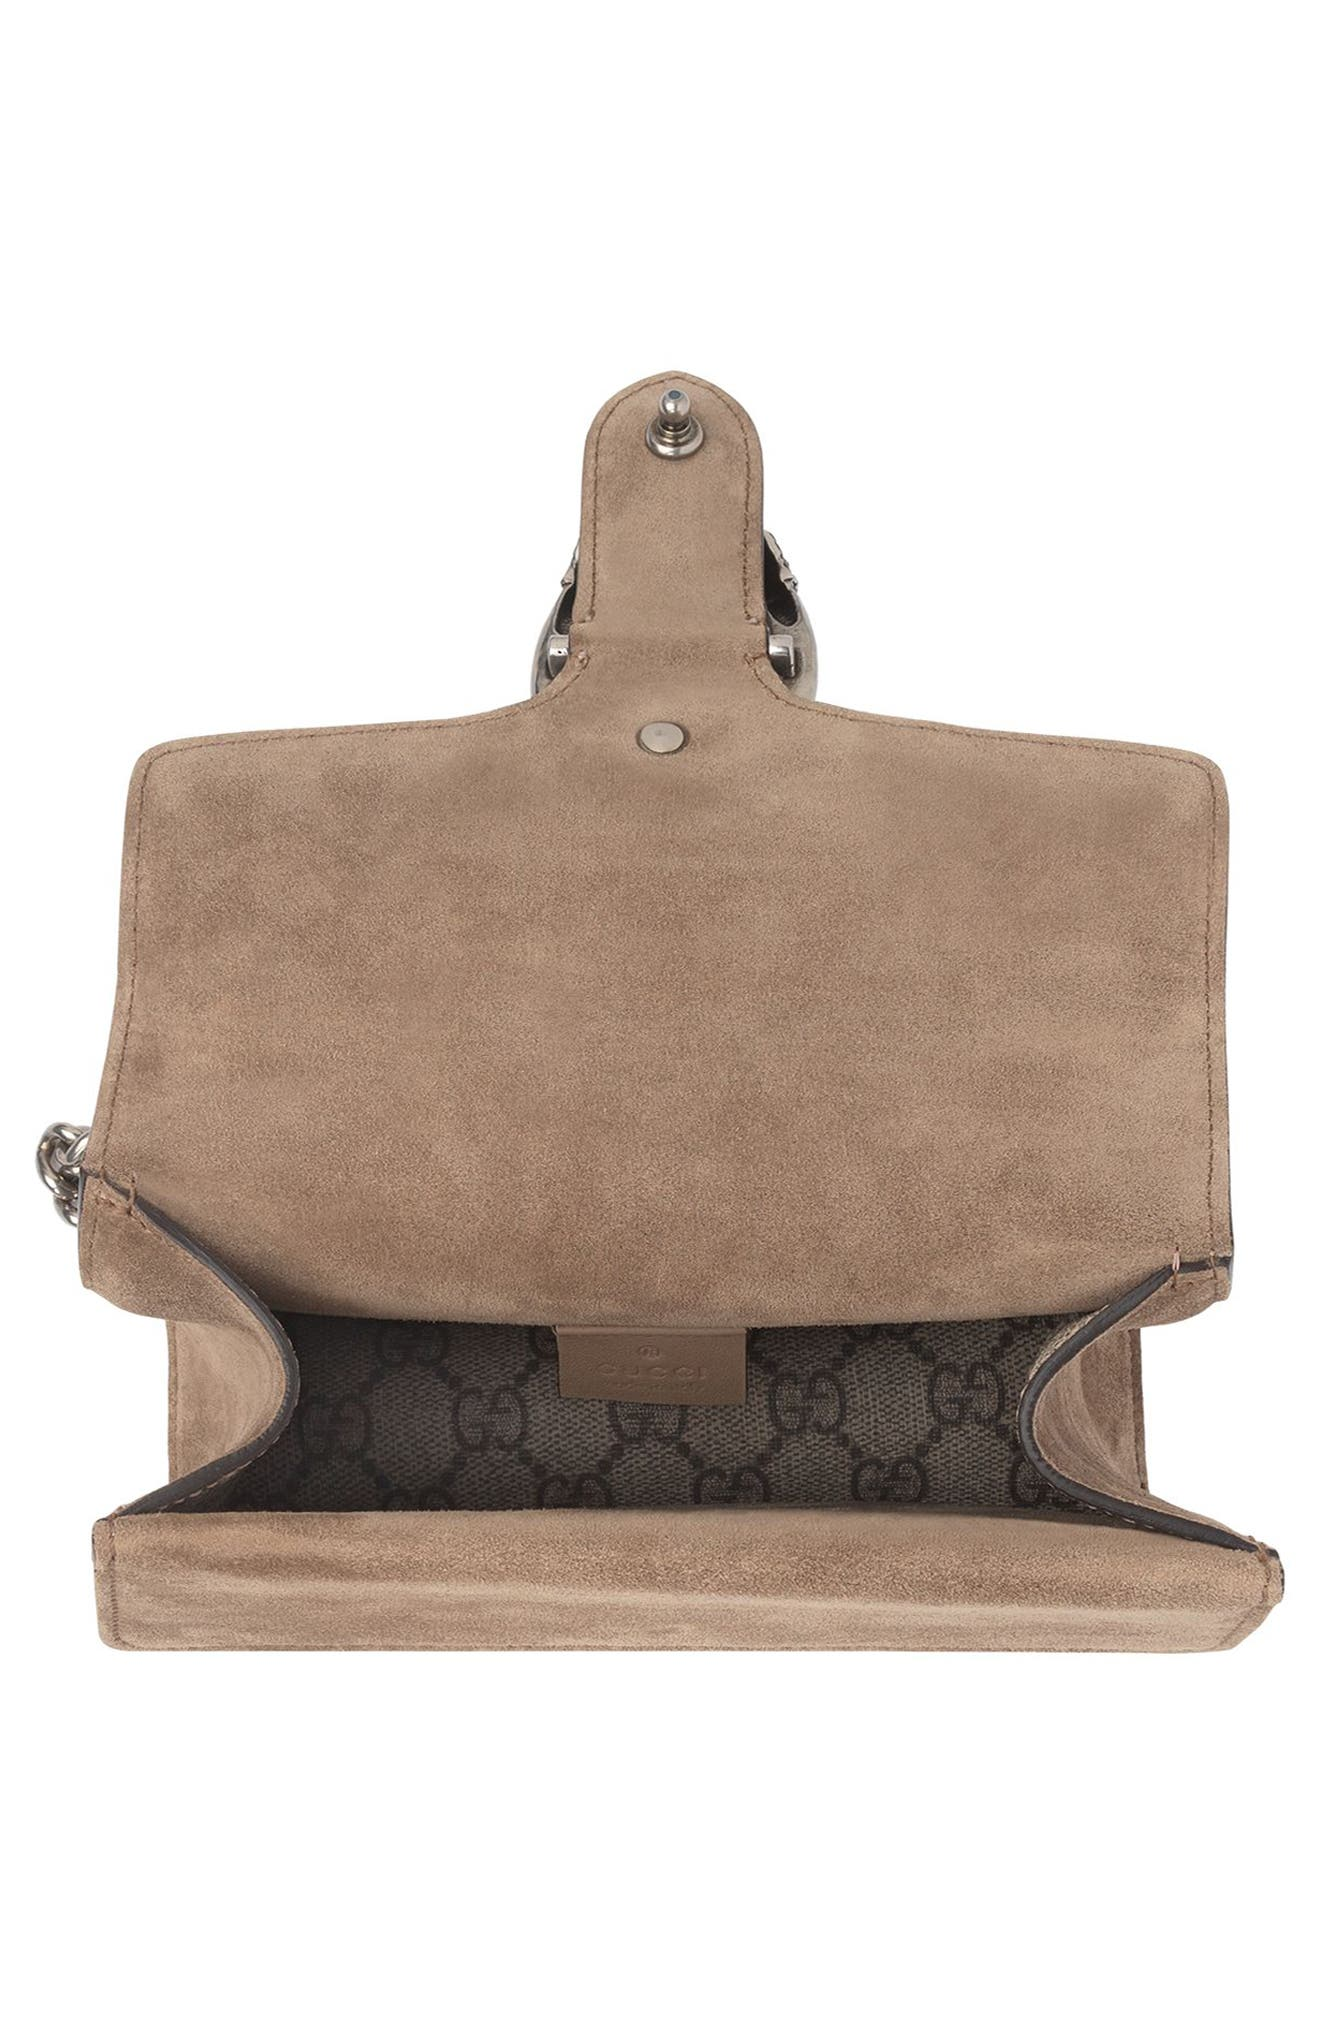 Alternate Image 3  - Gucci Mini Dionysus GG Supreme Shoulder Bag